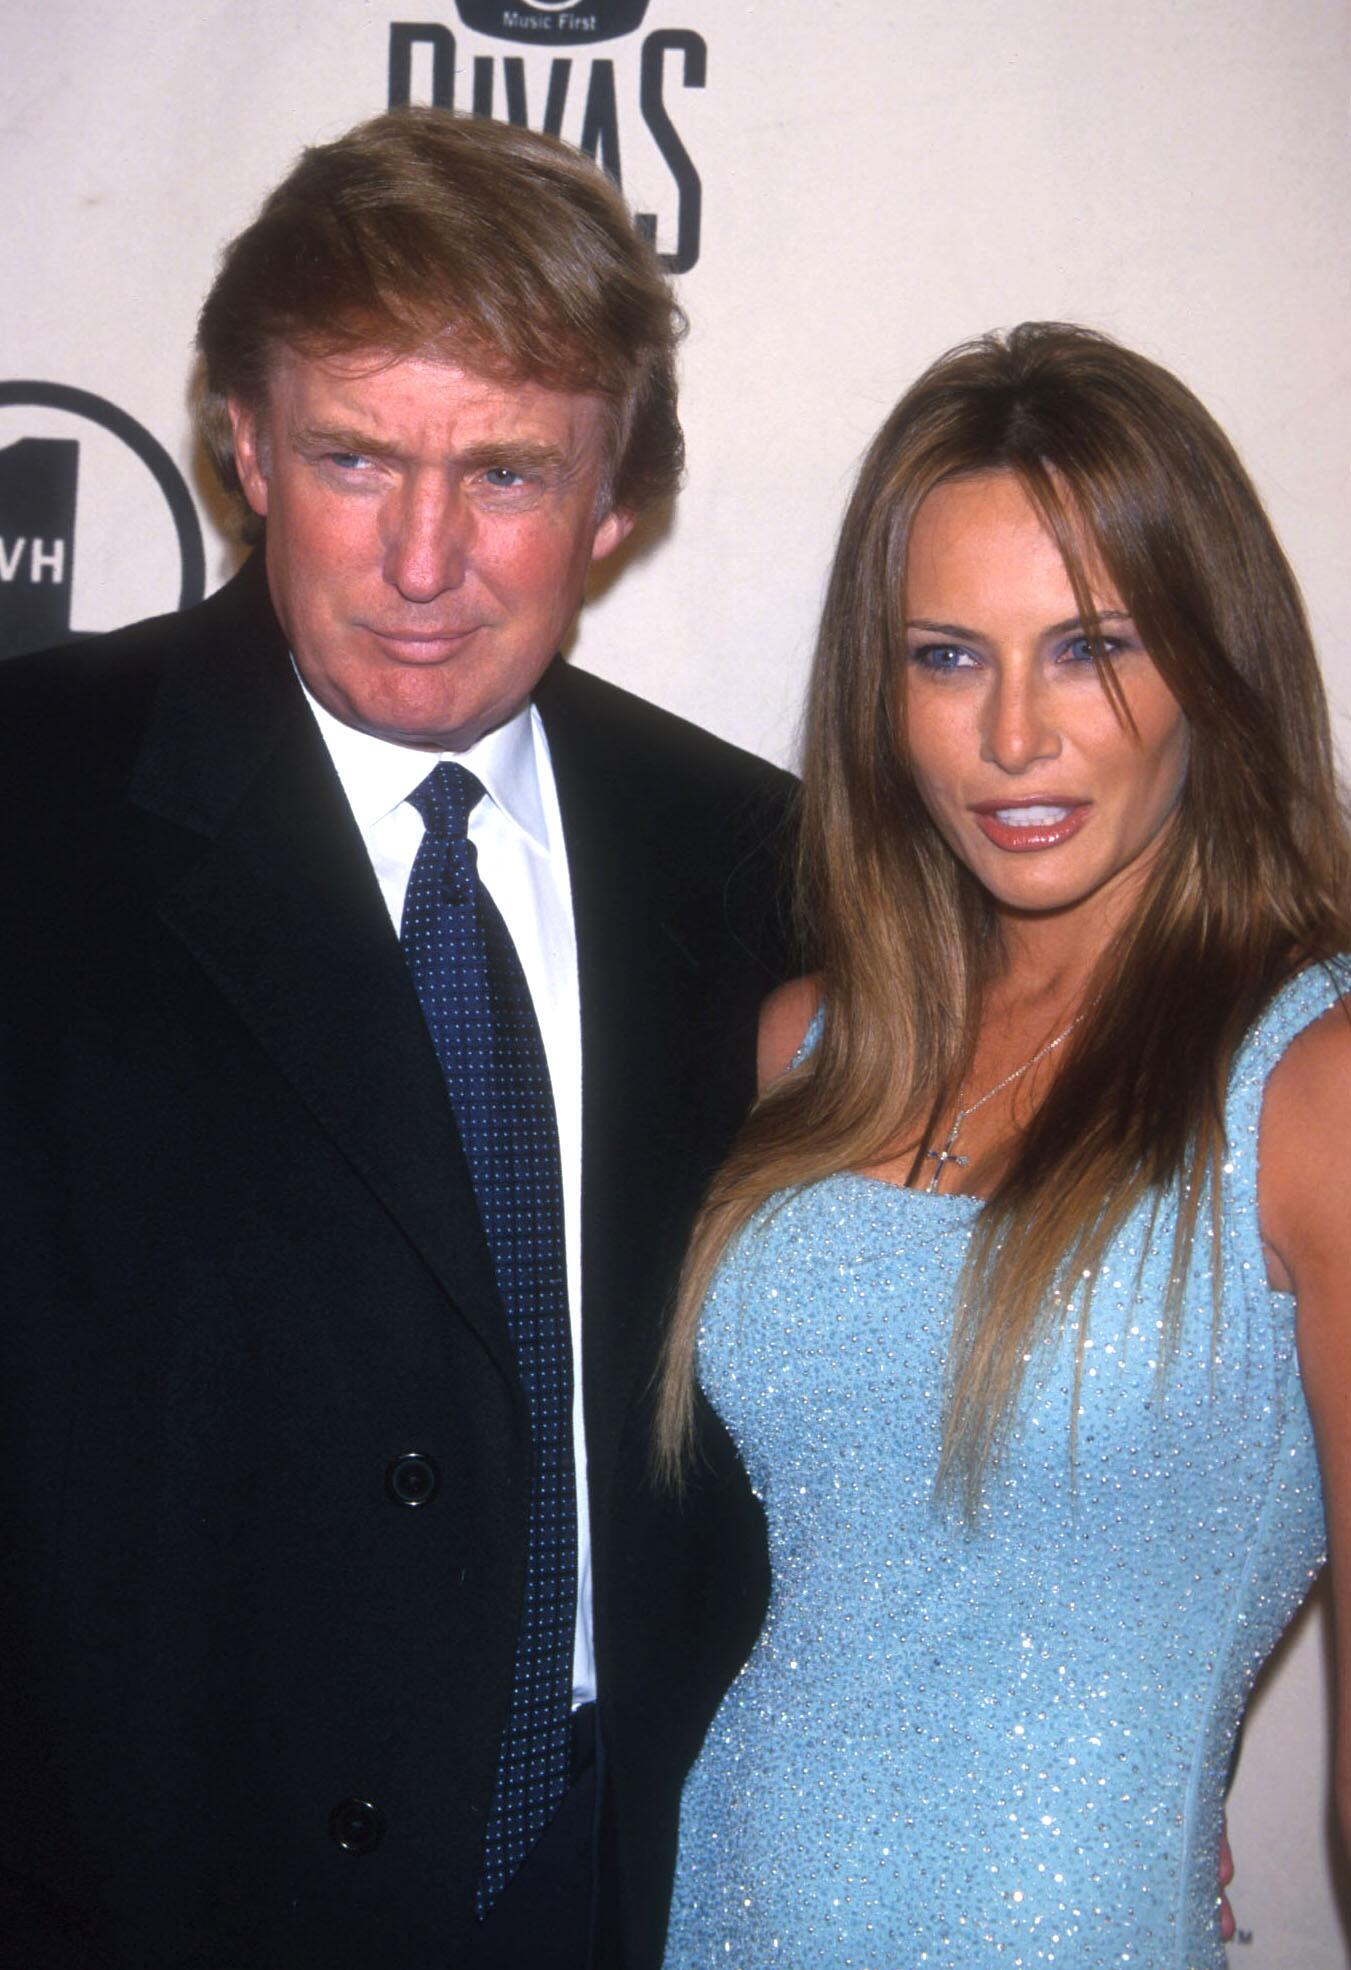 Bild zu Donald Trump, Melania Knauss